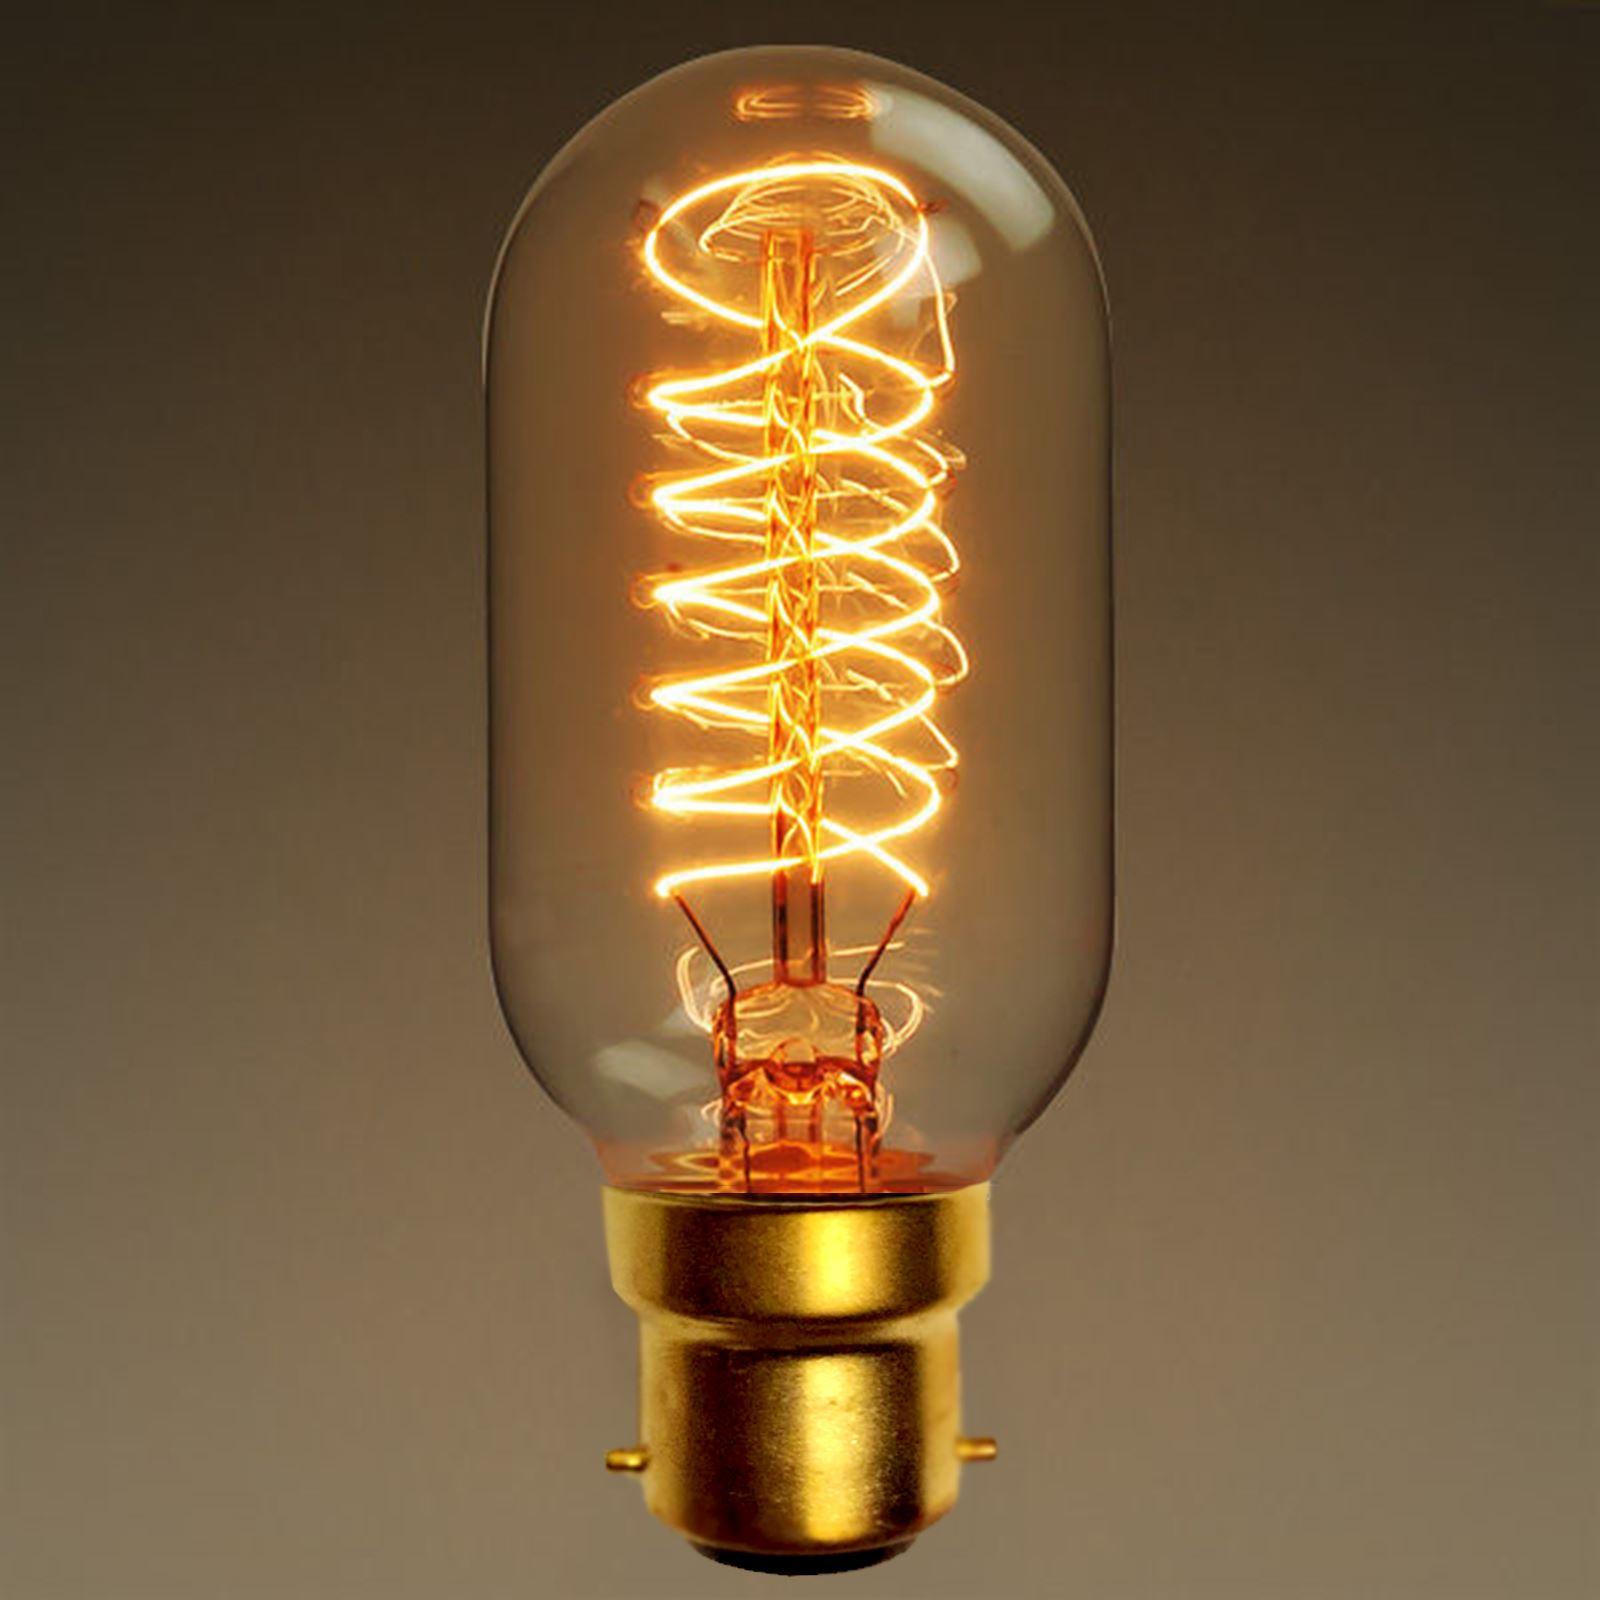 Affinity 4 2w 40w Filament Led Gls Es E27 Clear Light: B22 Bayonet 40W E27 Vintage Antique Retro Amber Light